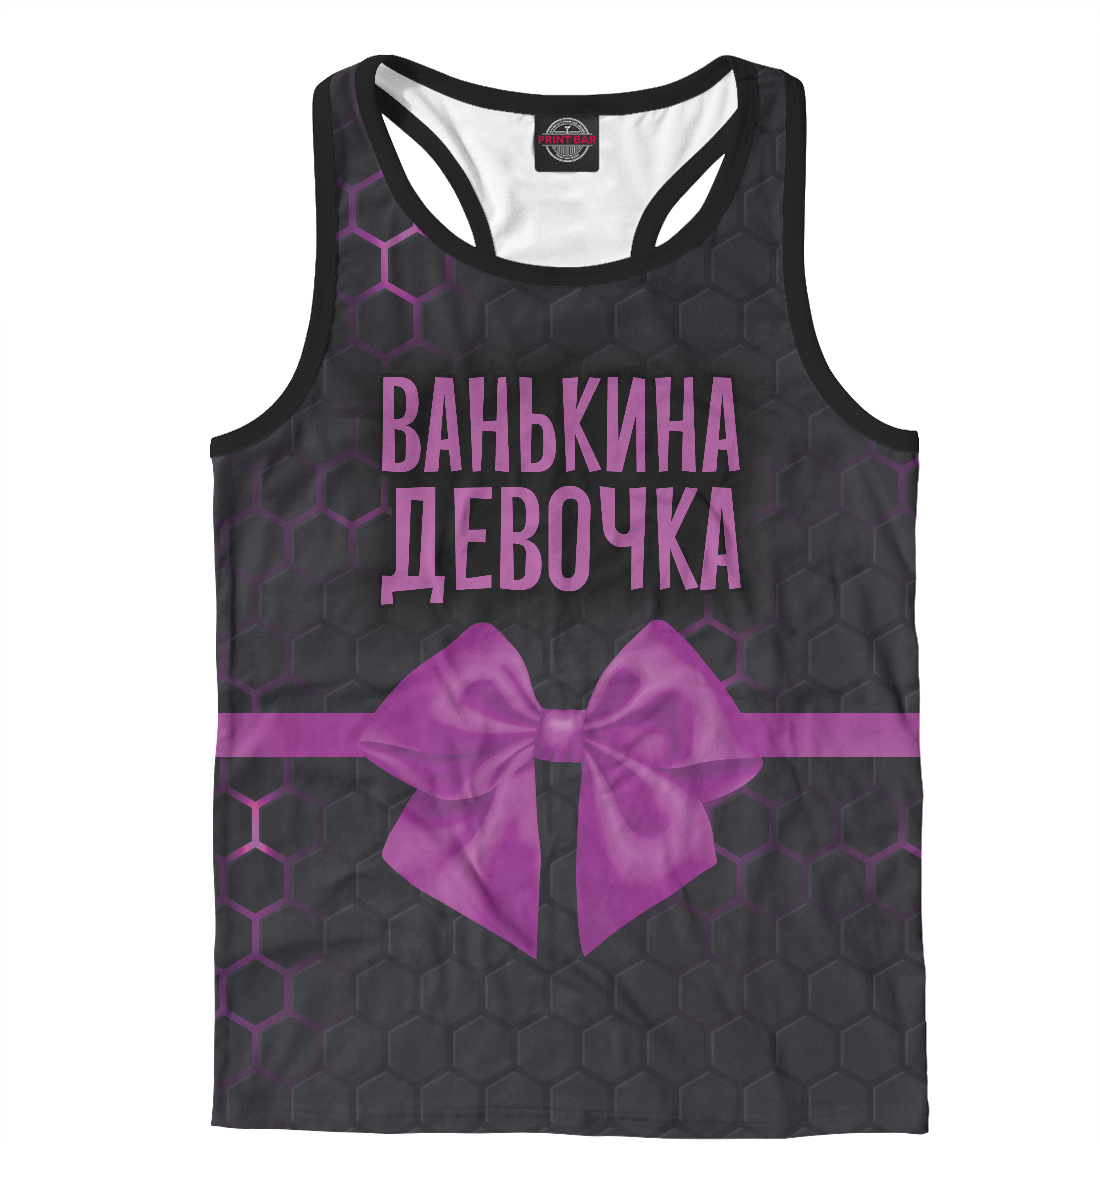 Майка борцовка Ванькина девочка (351264)